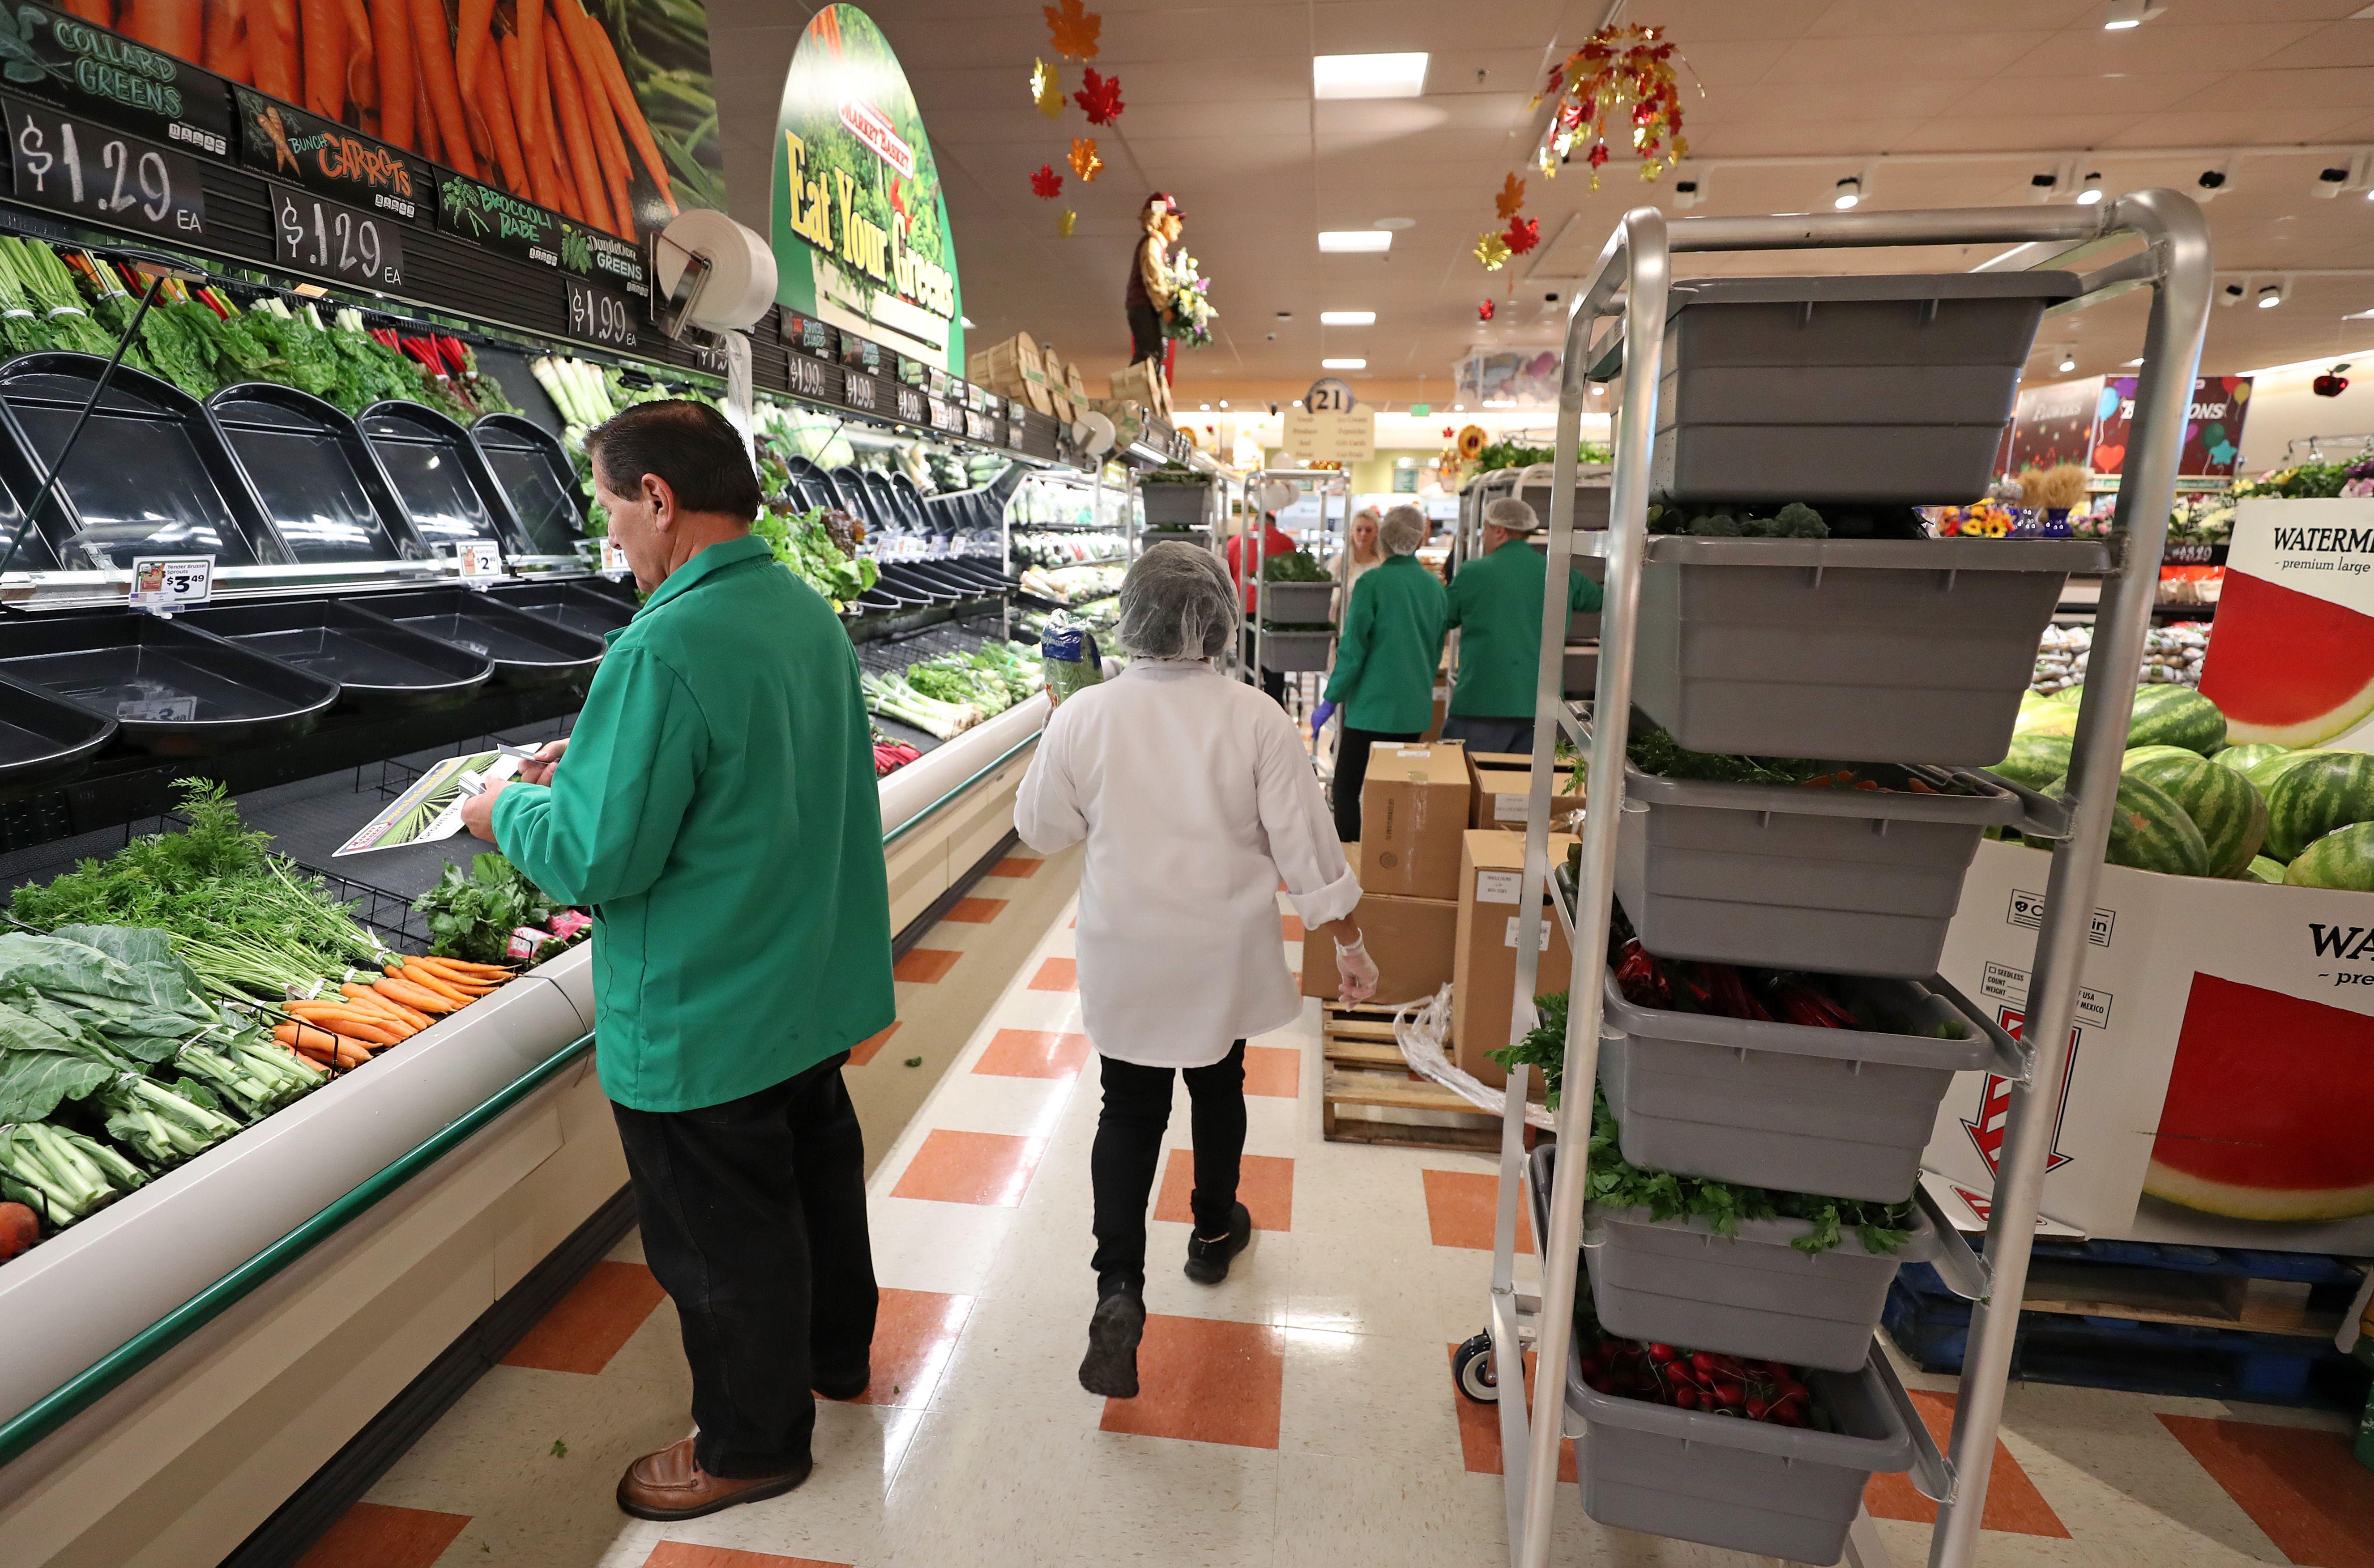 Take a look inside the new Market Basket in Lynn - The